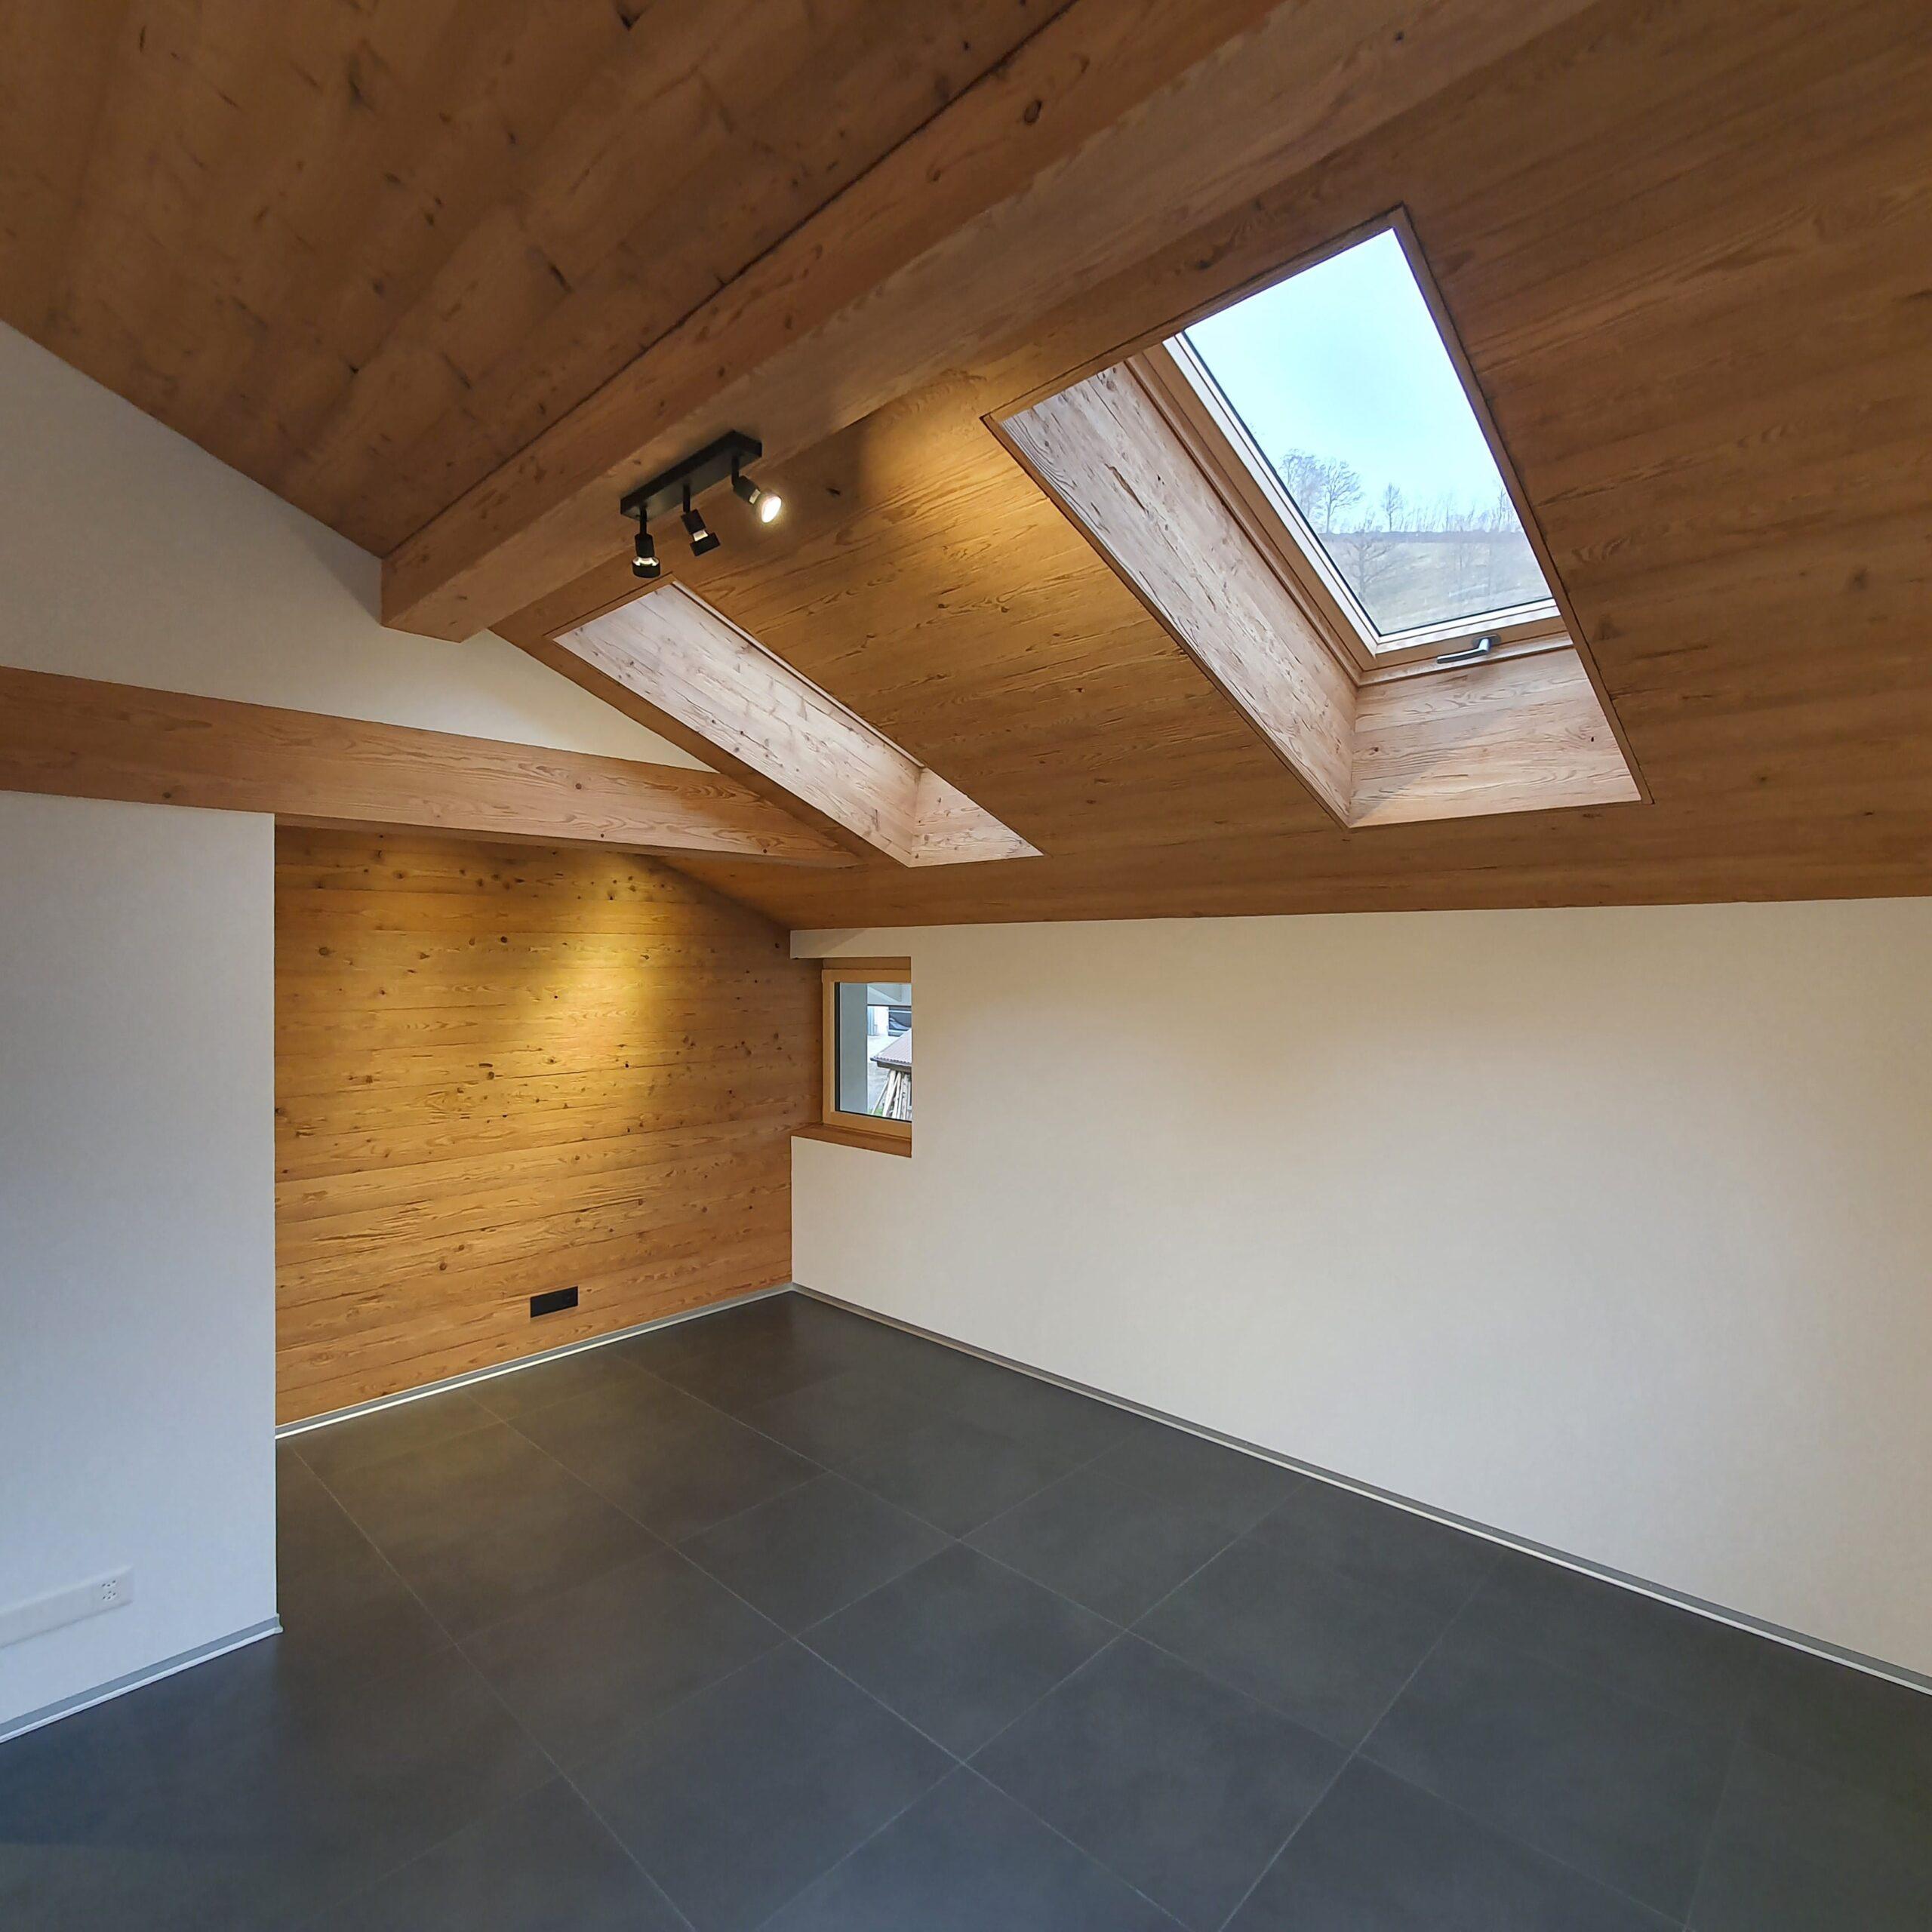 Wooddesign_Holzdesign_Innenausbau_ Umbau_Altholz_rustikal_modern Holzdecke_Balkenverkleidung_Wandverkleidung_Wohnungumbau_Ausbau Wohnung (5)-min